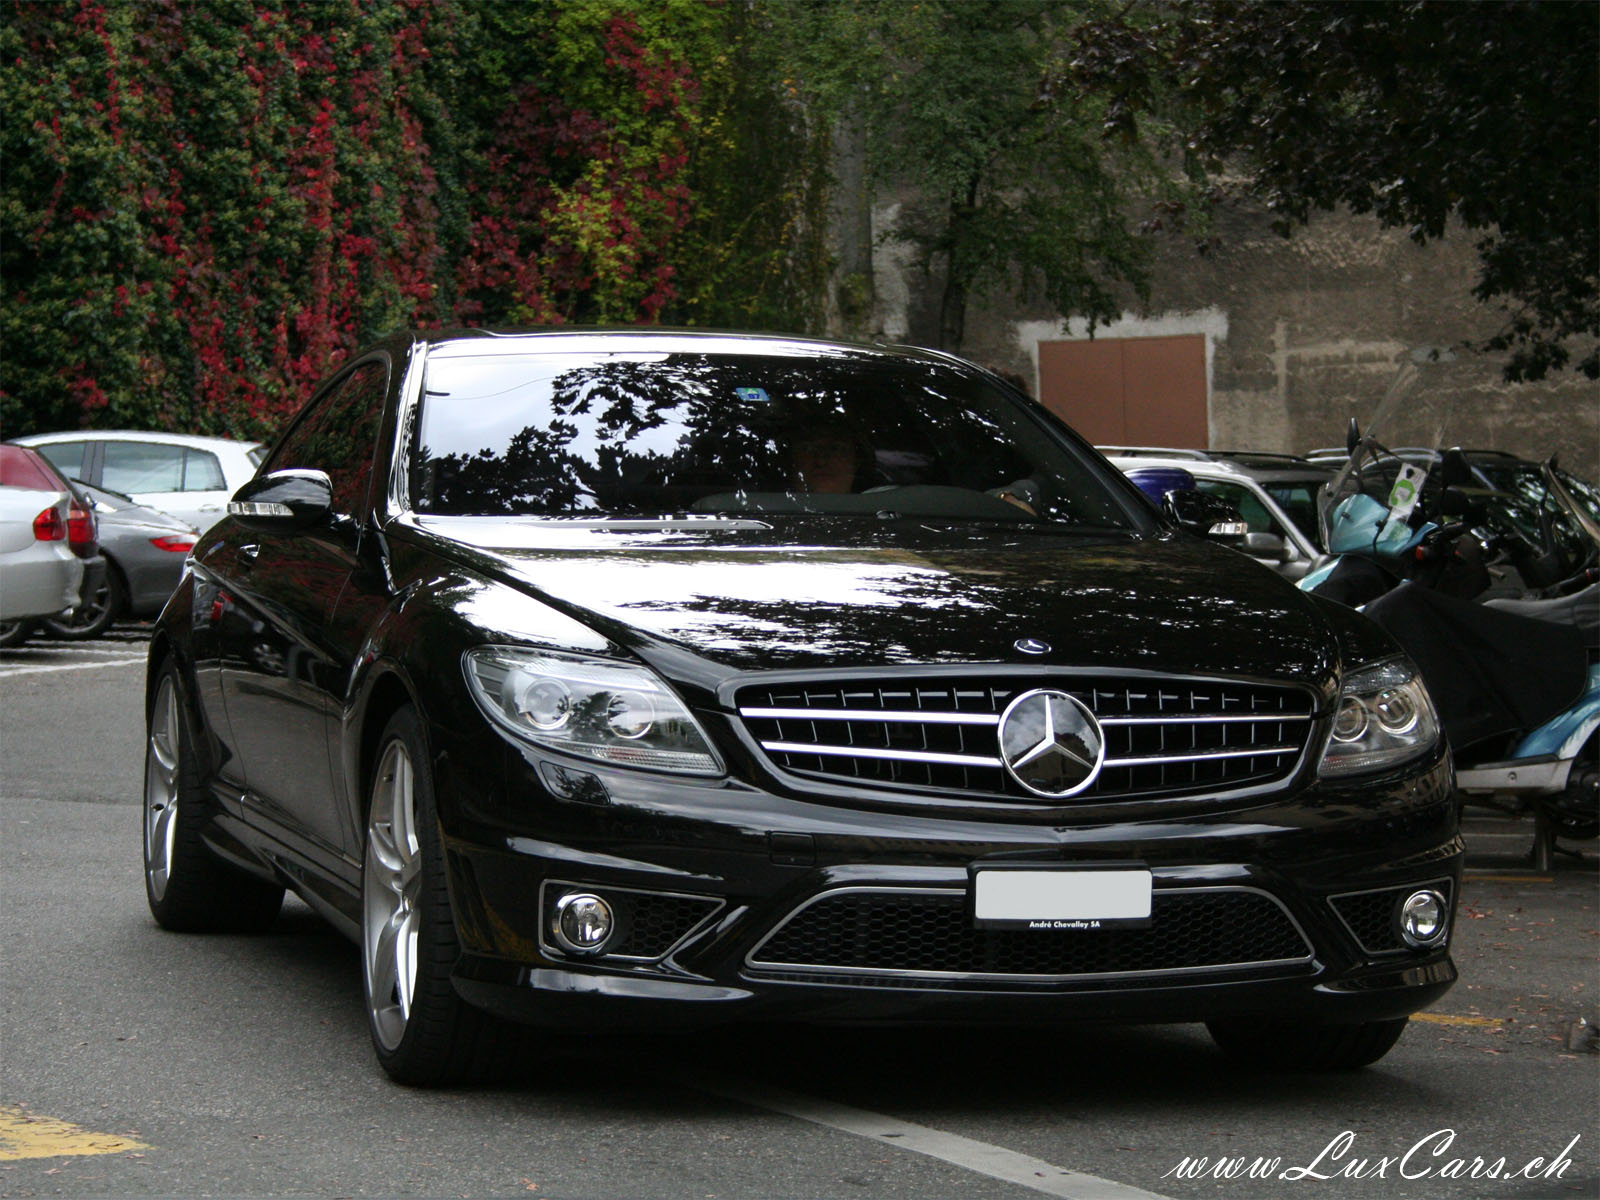 mersedes+arabalar+HEDZA+%252860%2529 Mercedes Modelleri